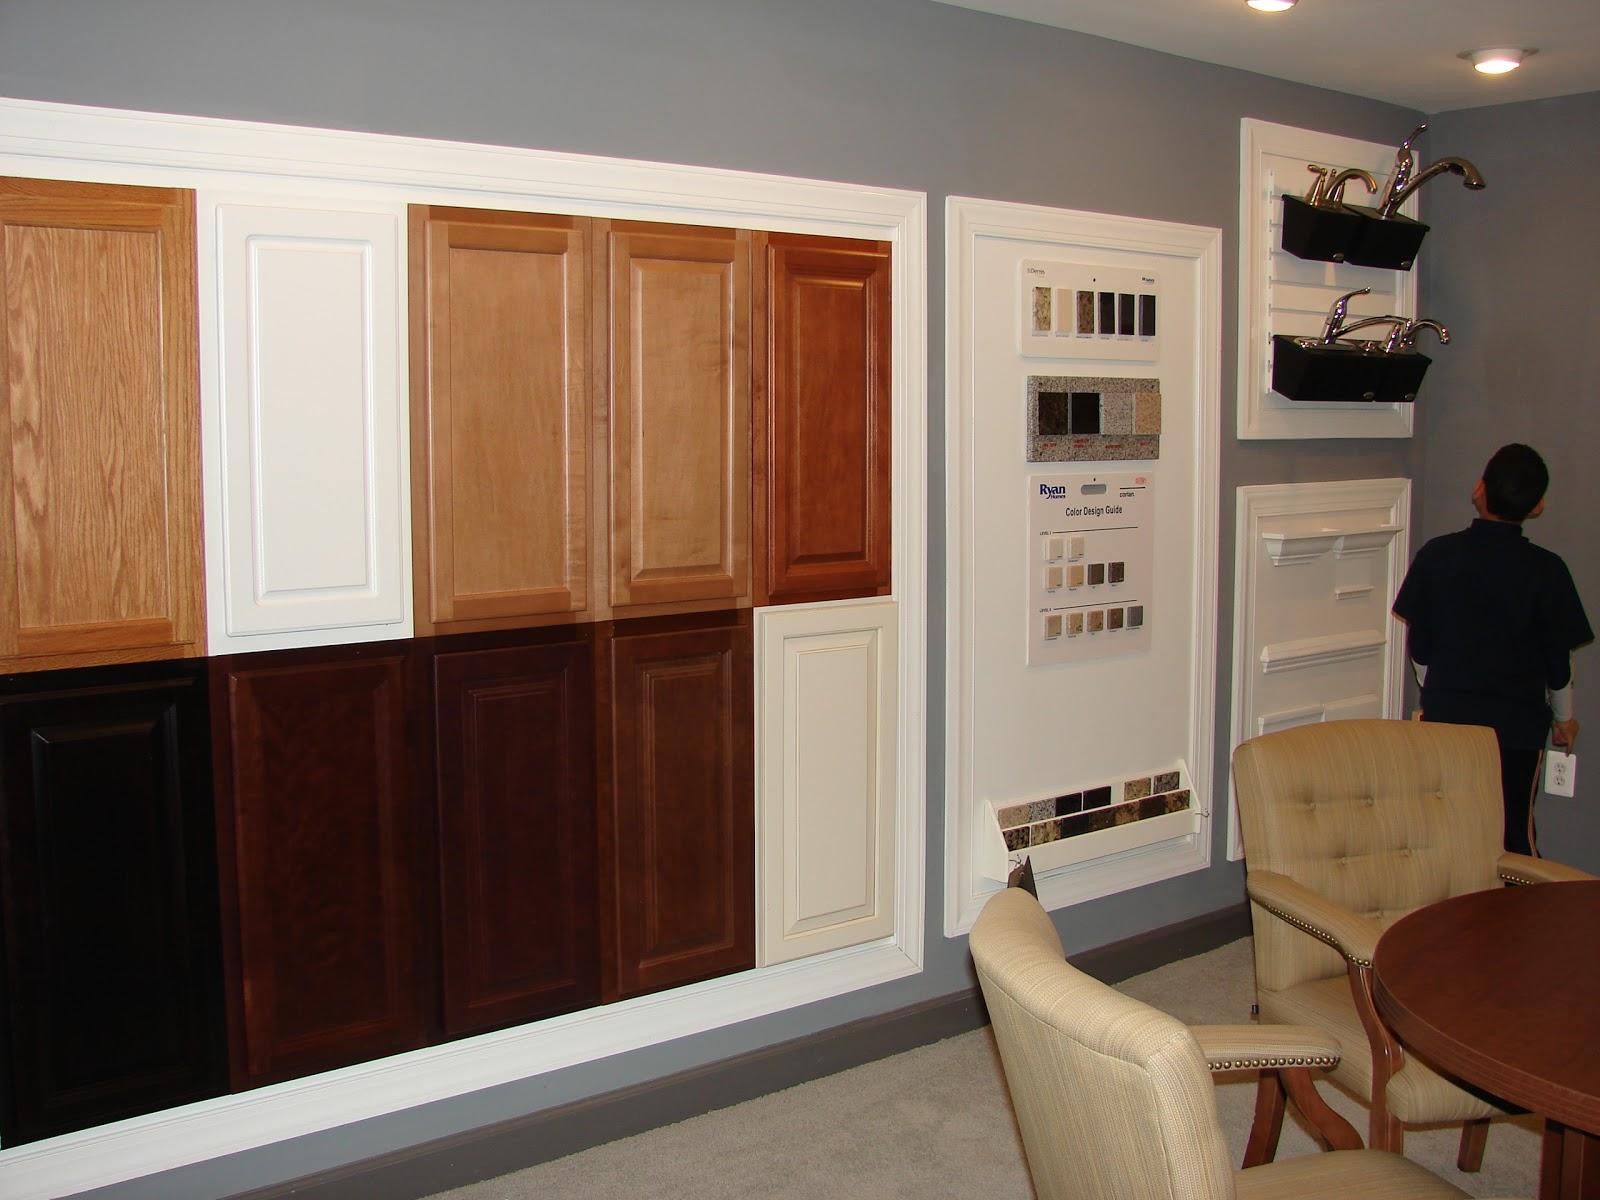 Building A Ryan Home: Avalon: Cabinet Choices